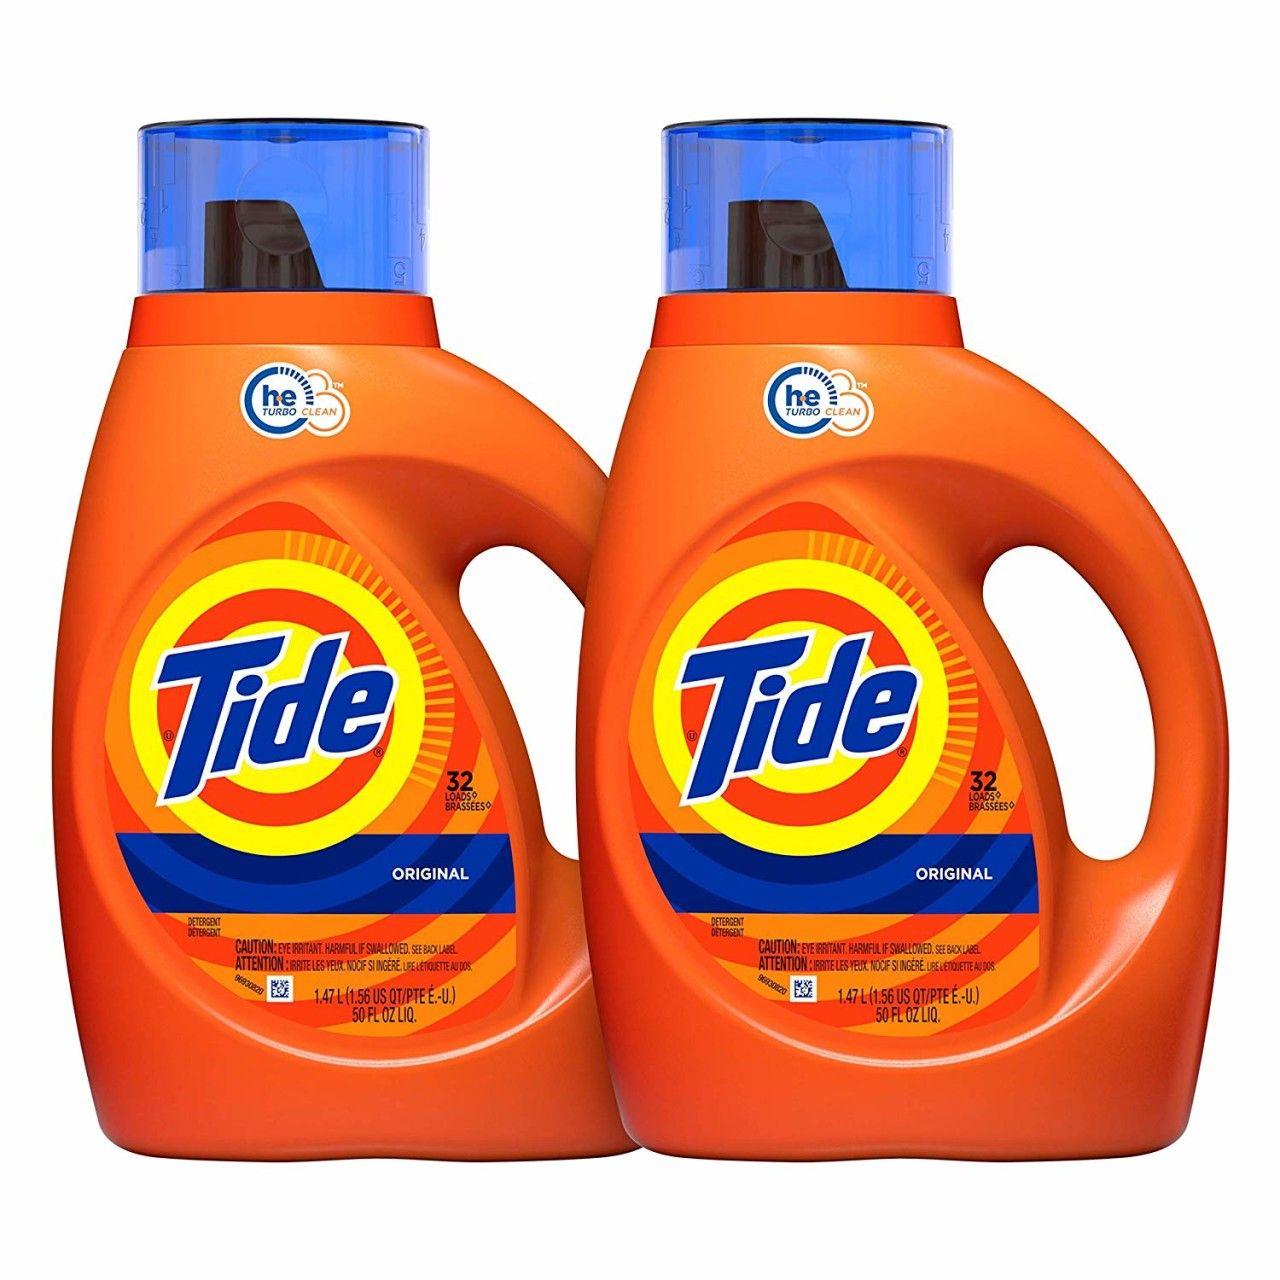 Tide Original Scent He Turbo Clean Liquid Laundry Detergent 50 Fl